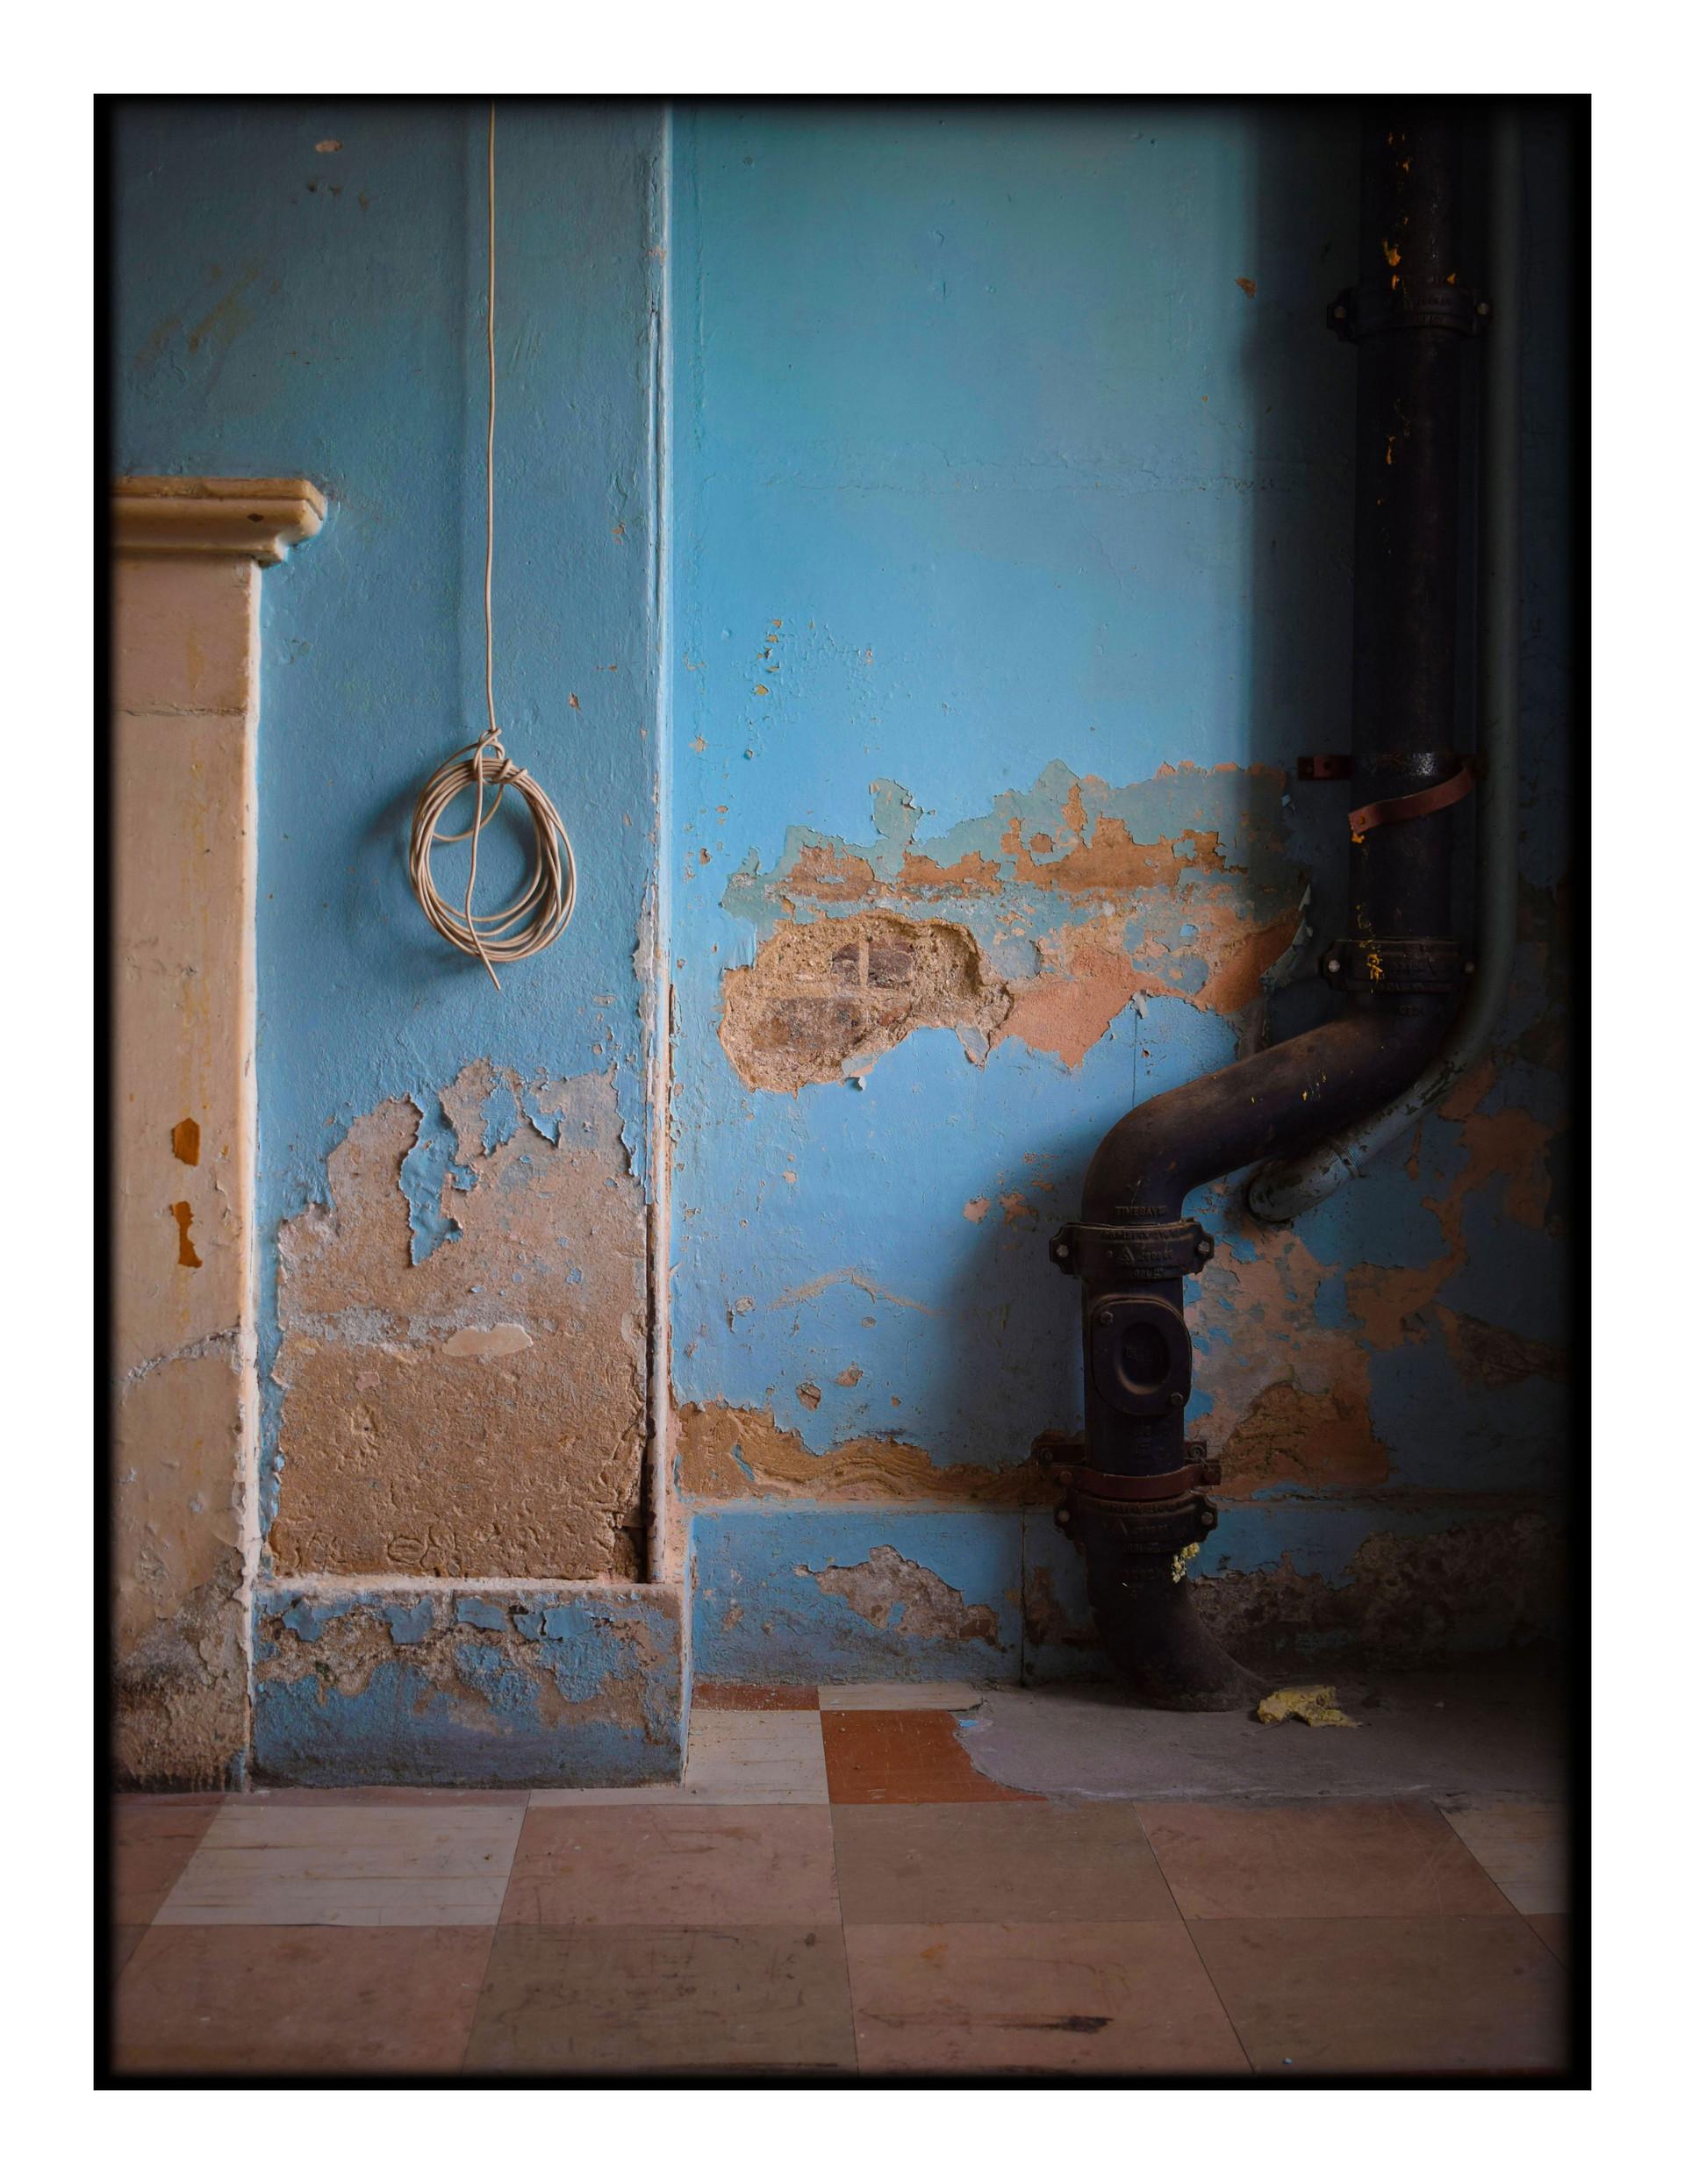 Disused kitchen - Beckenham Place Mansion, 2017